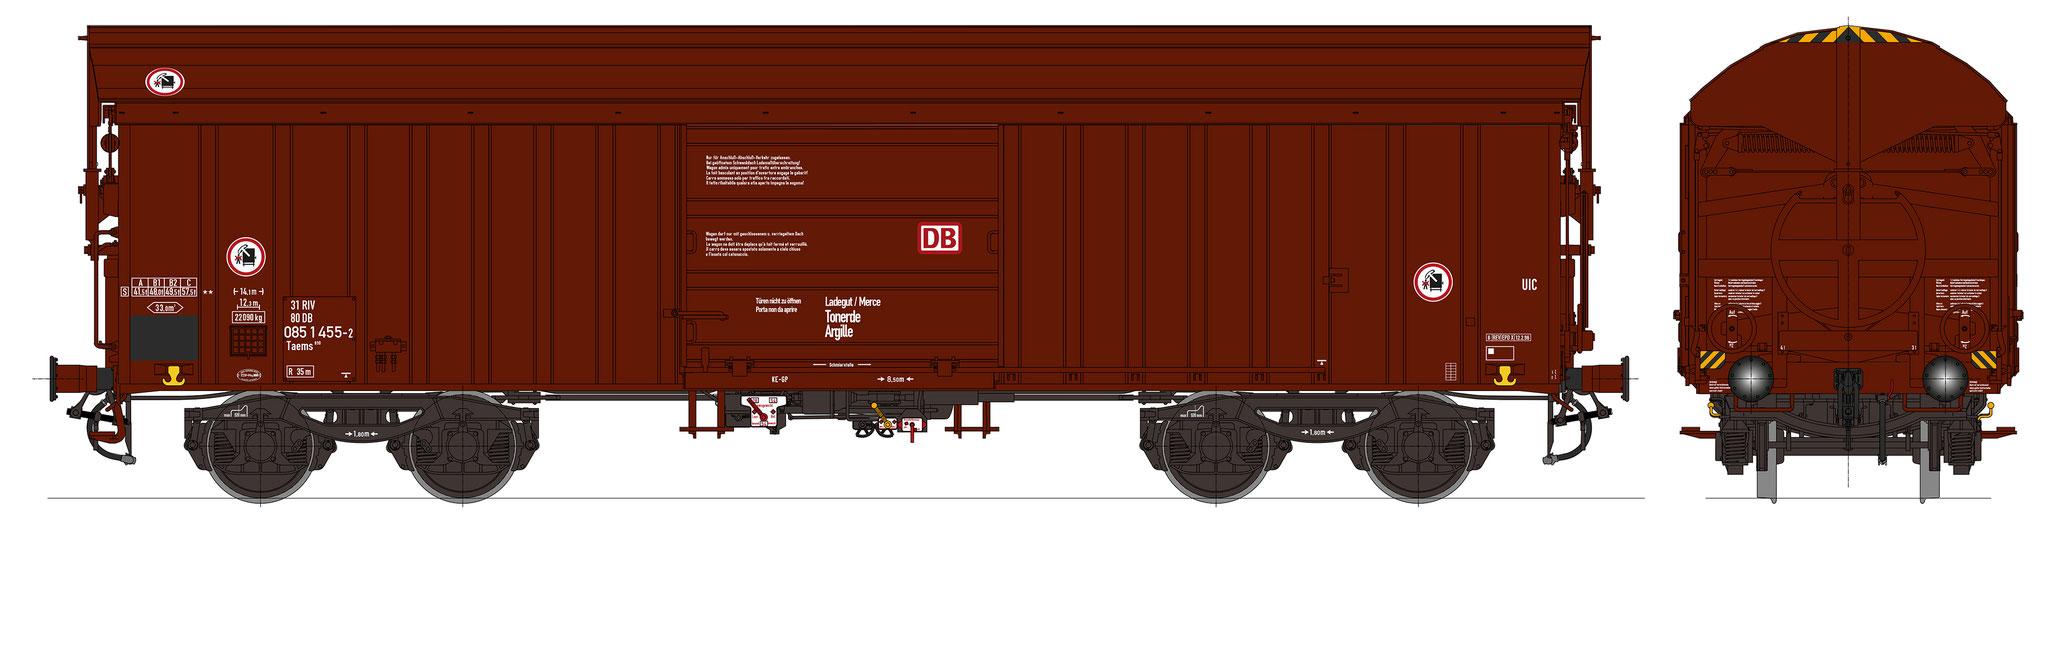 Bestell-Nr. 16068, Ep. 5, Fahrgestell graubraun